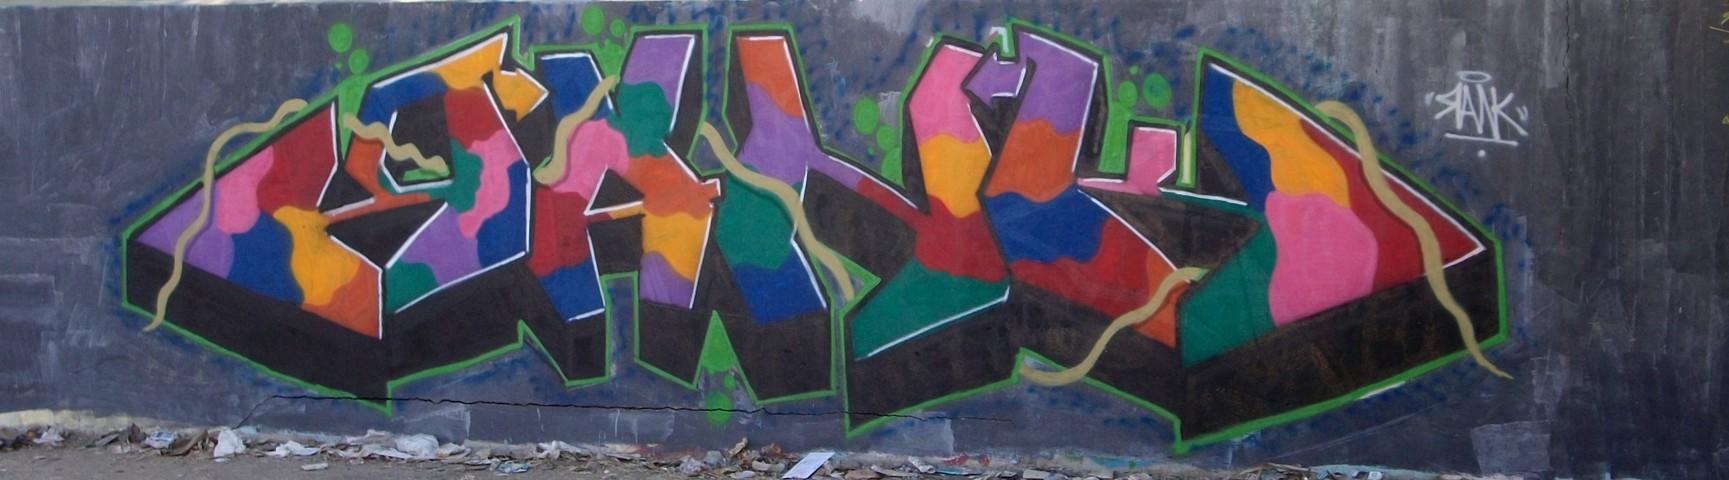 Photo #7210 by Ranko